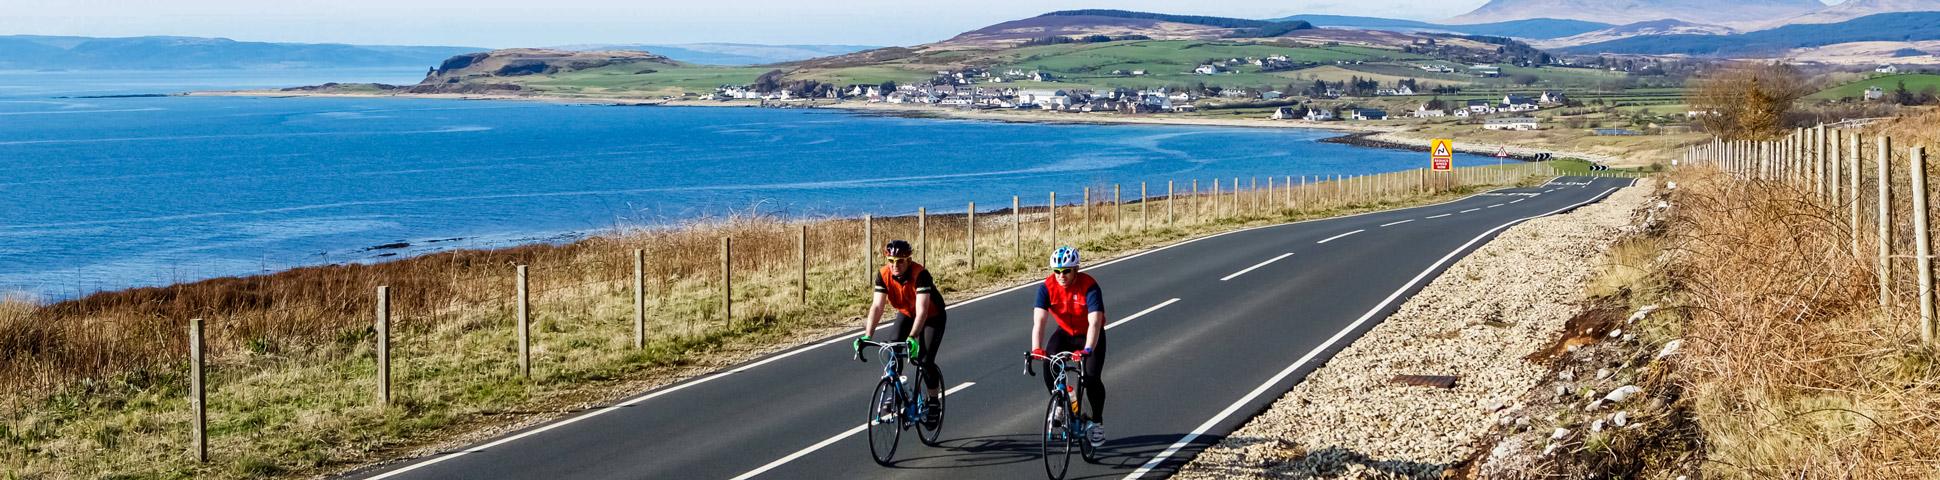 Panoramic views on Arran, Islay, and Jura Road Cycling Tour